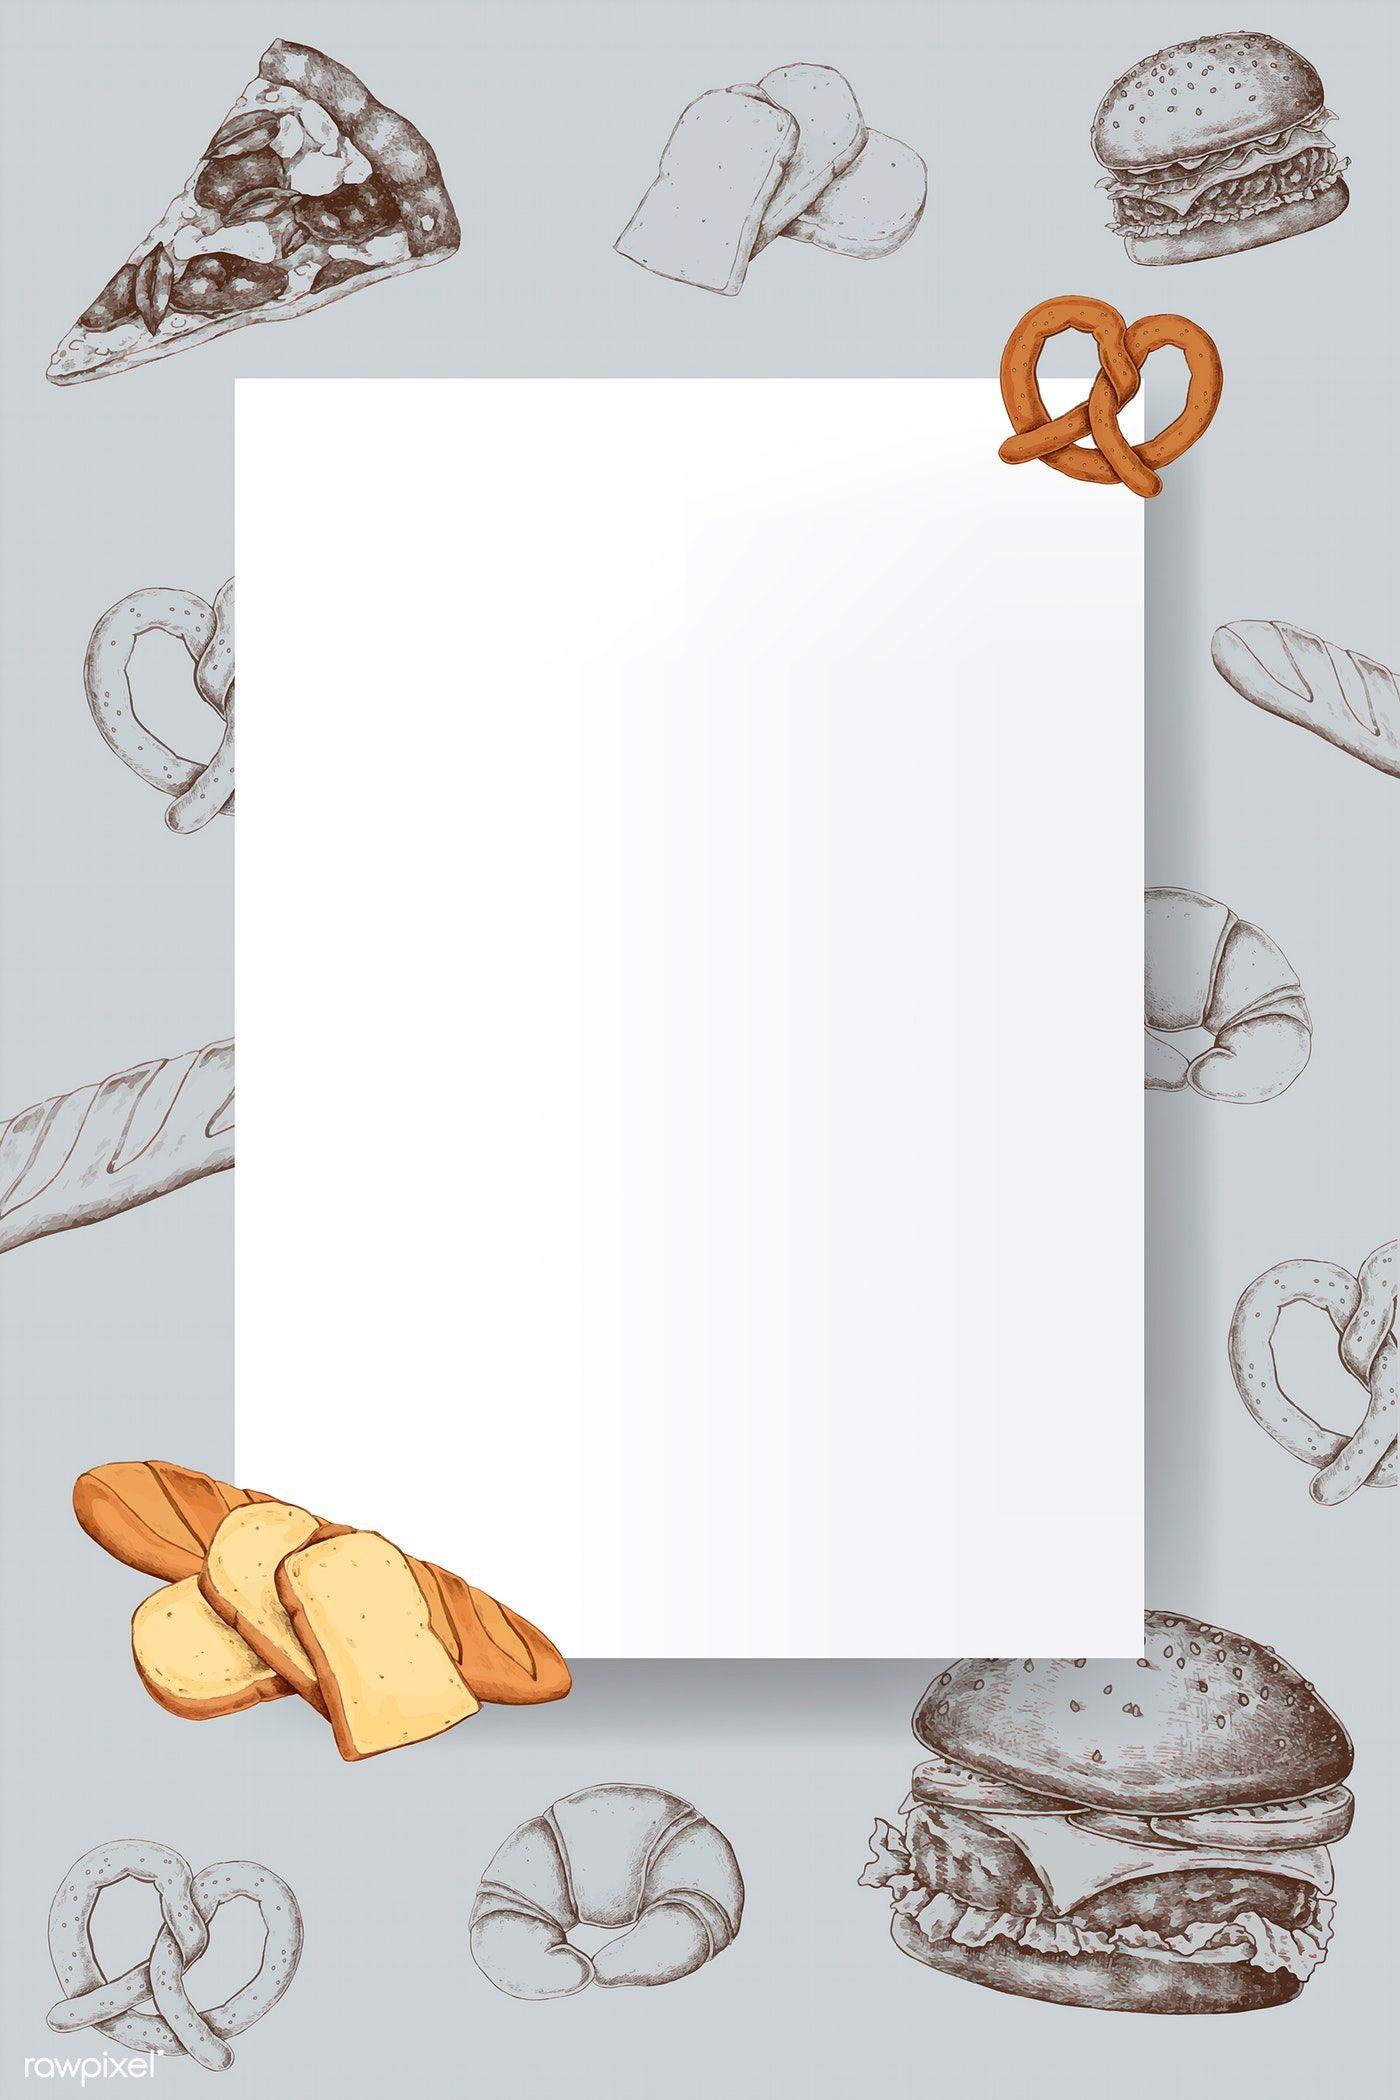 Download Premium Vector Of Blank Bread Frame Design Vector 1209024 Frame Design Food Poster Design Frame